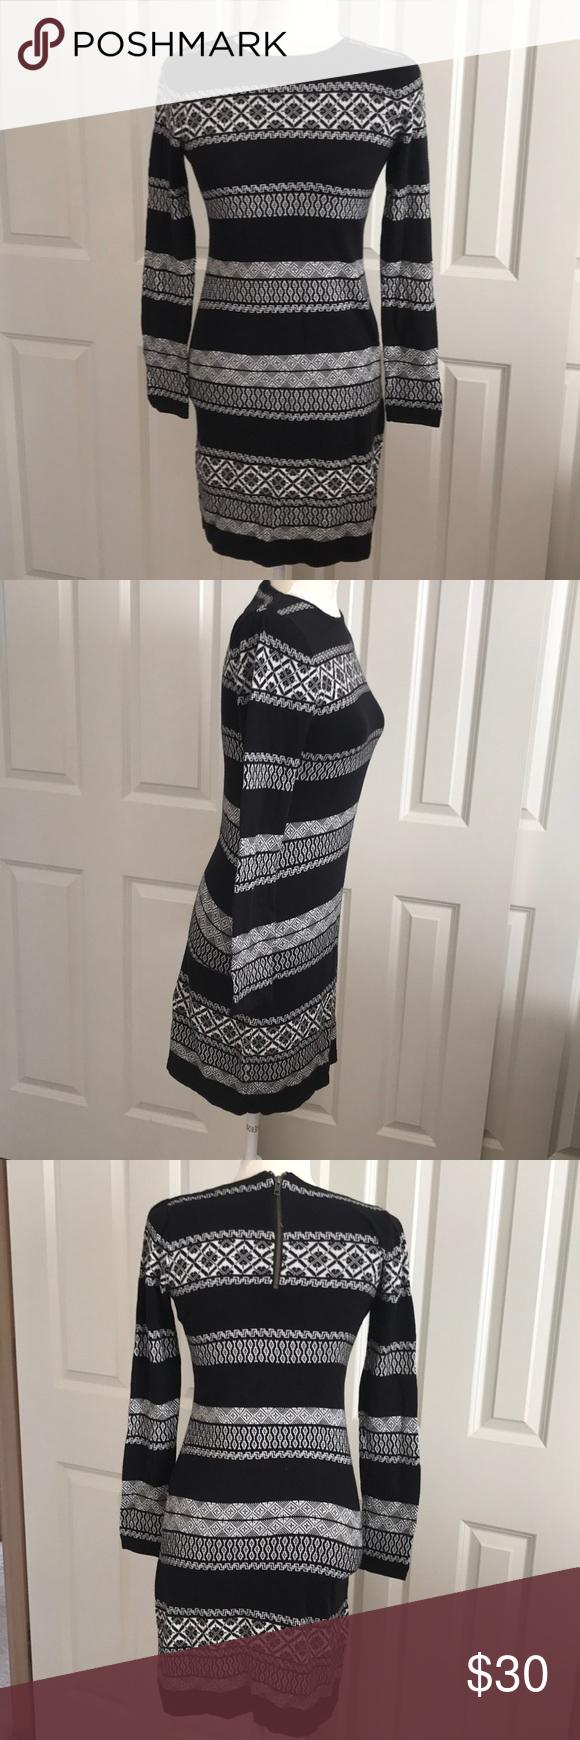 b961ab30b44 Cynthia Rowley Sweater Dress Adorable Cynthia Rowley sweater dress